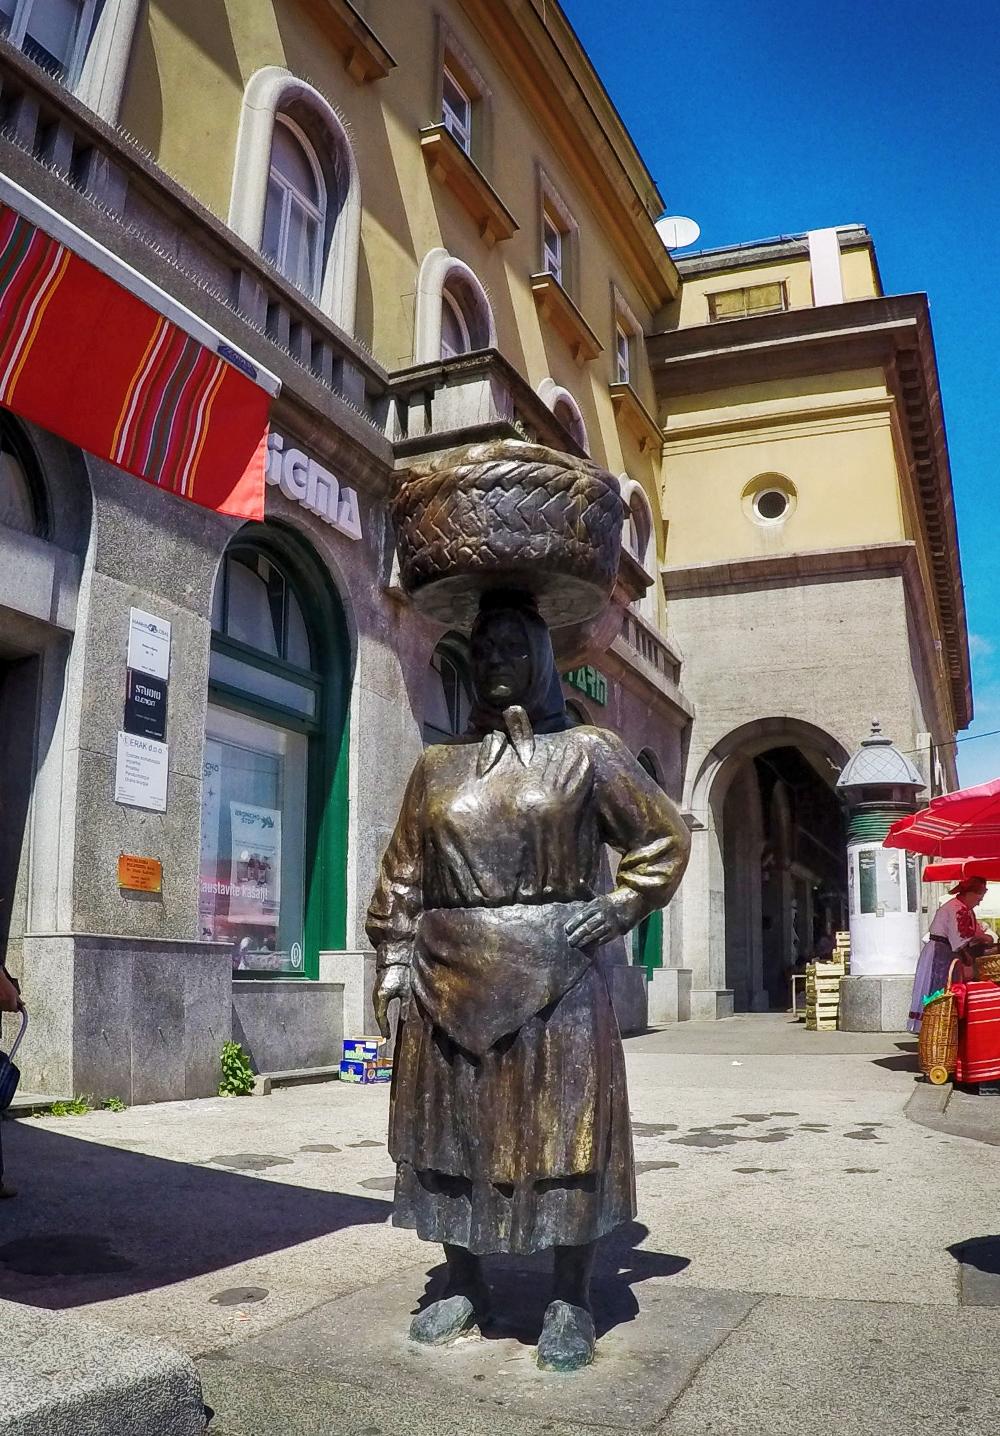 A statue of Kumica Barica